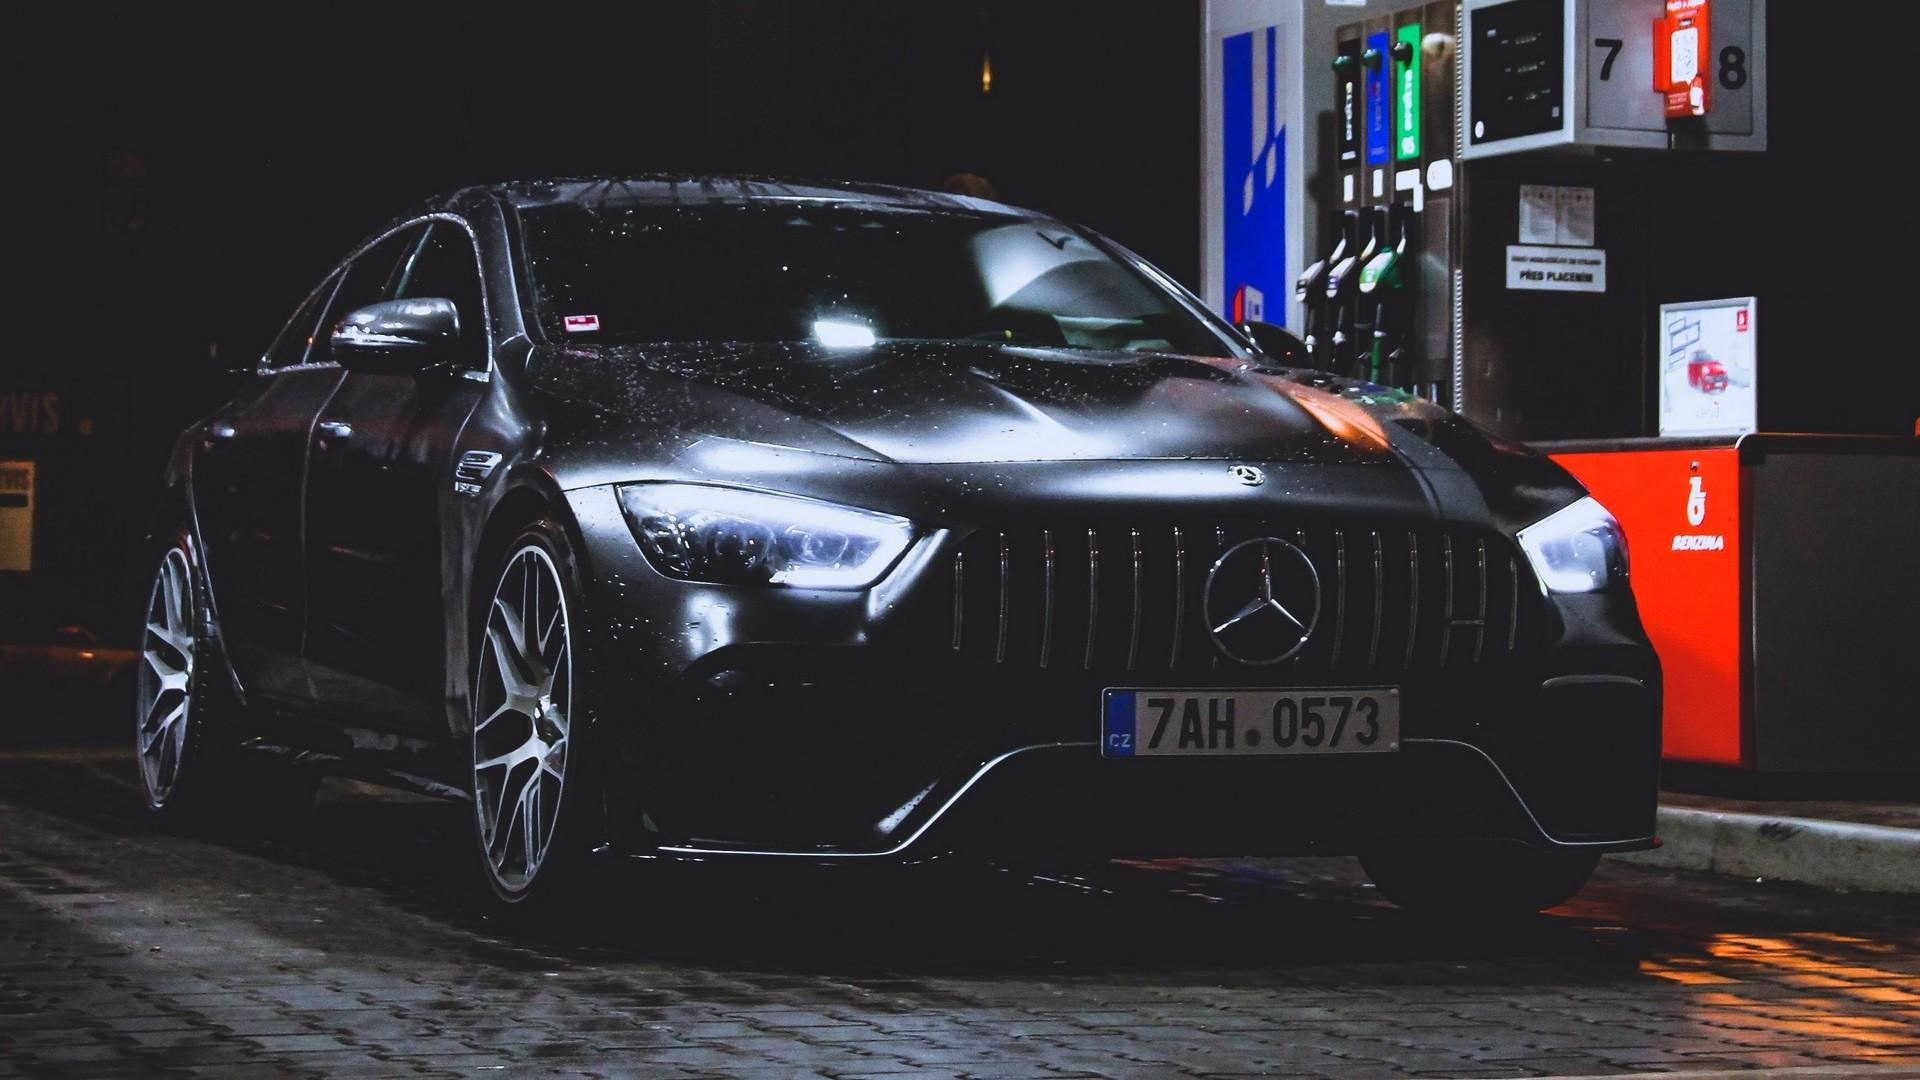 Importer une voiture en allemagne avec motorimport 237 - Blog